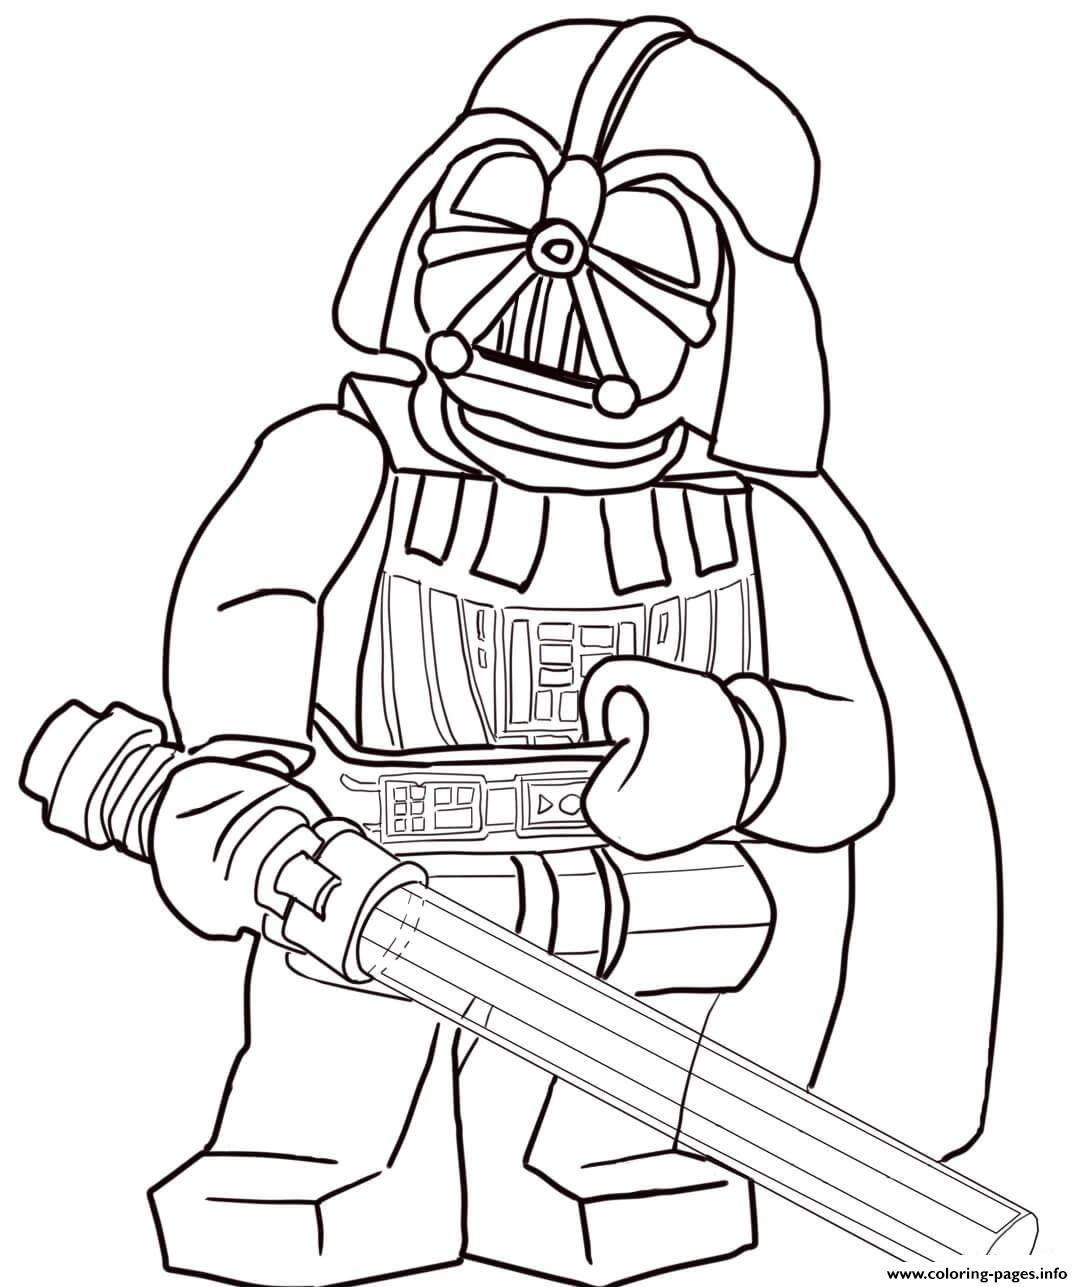 1083x1287 Print Lego Star Wars Darth Vader Coloring Pages Fiesta Birthday